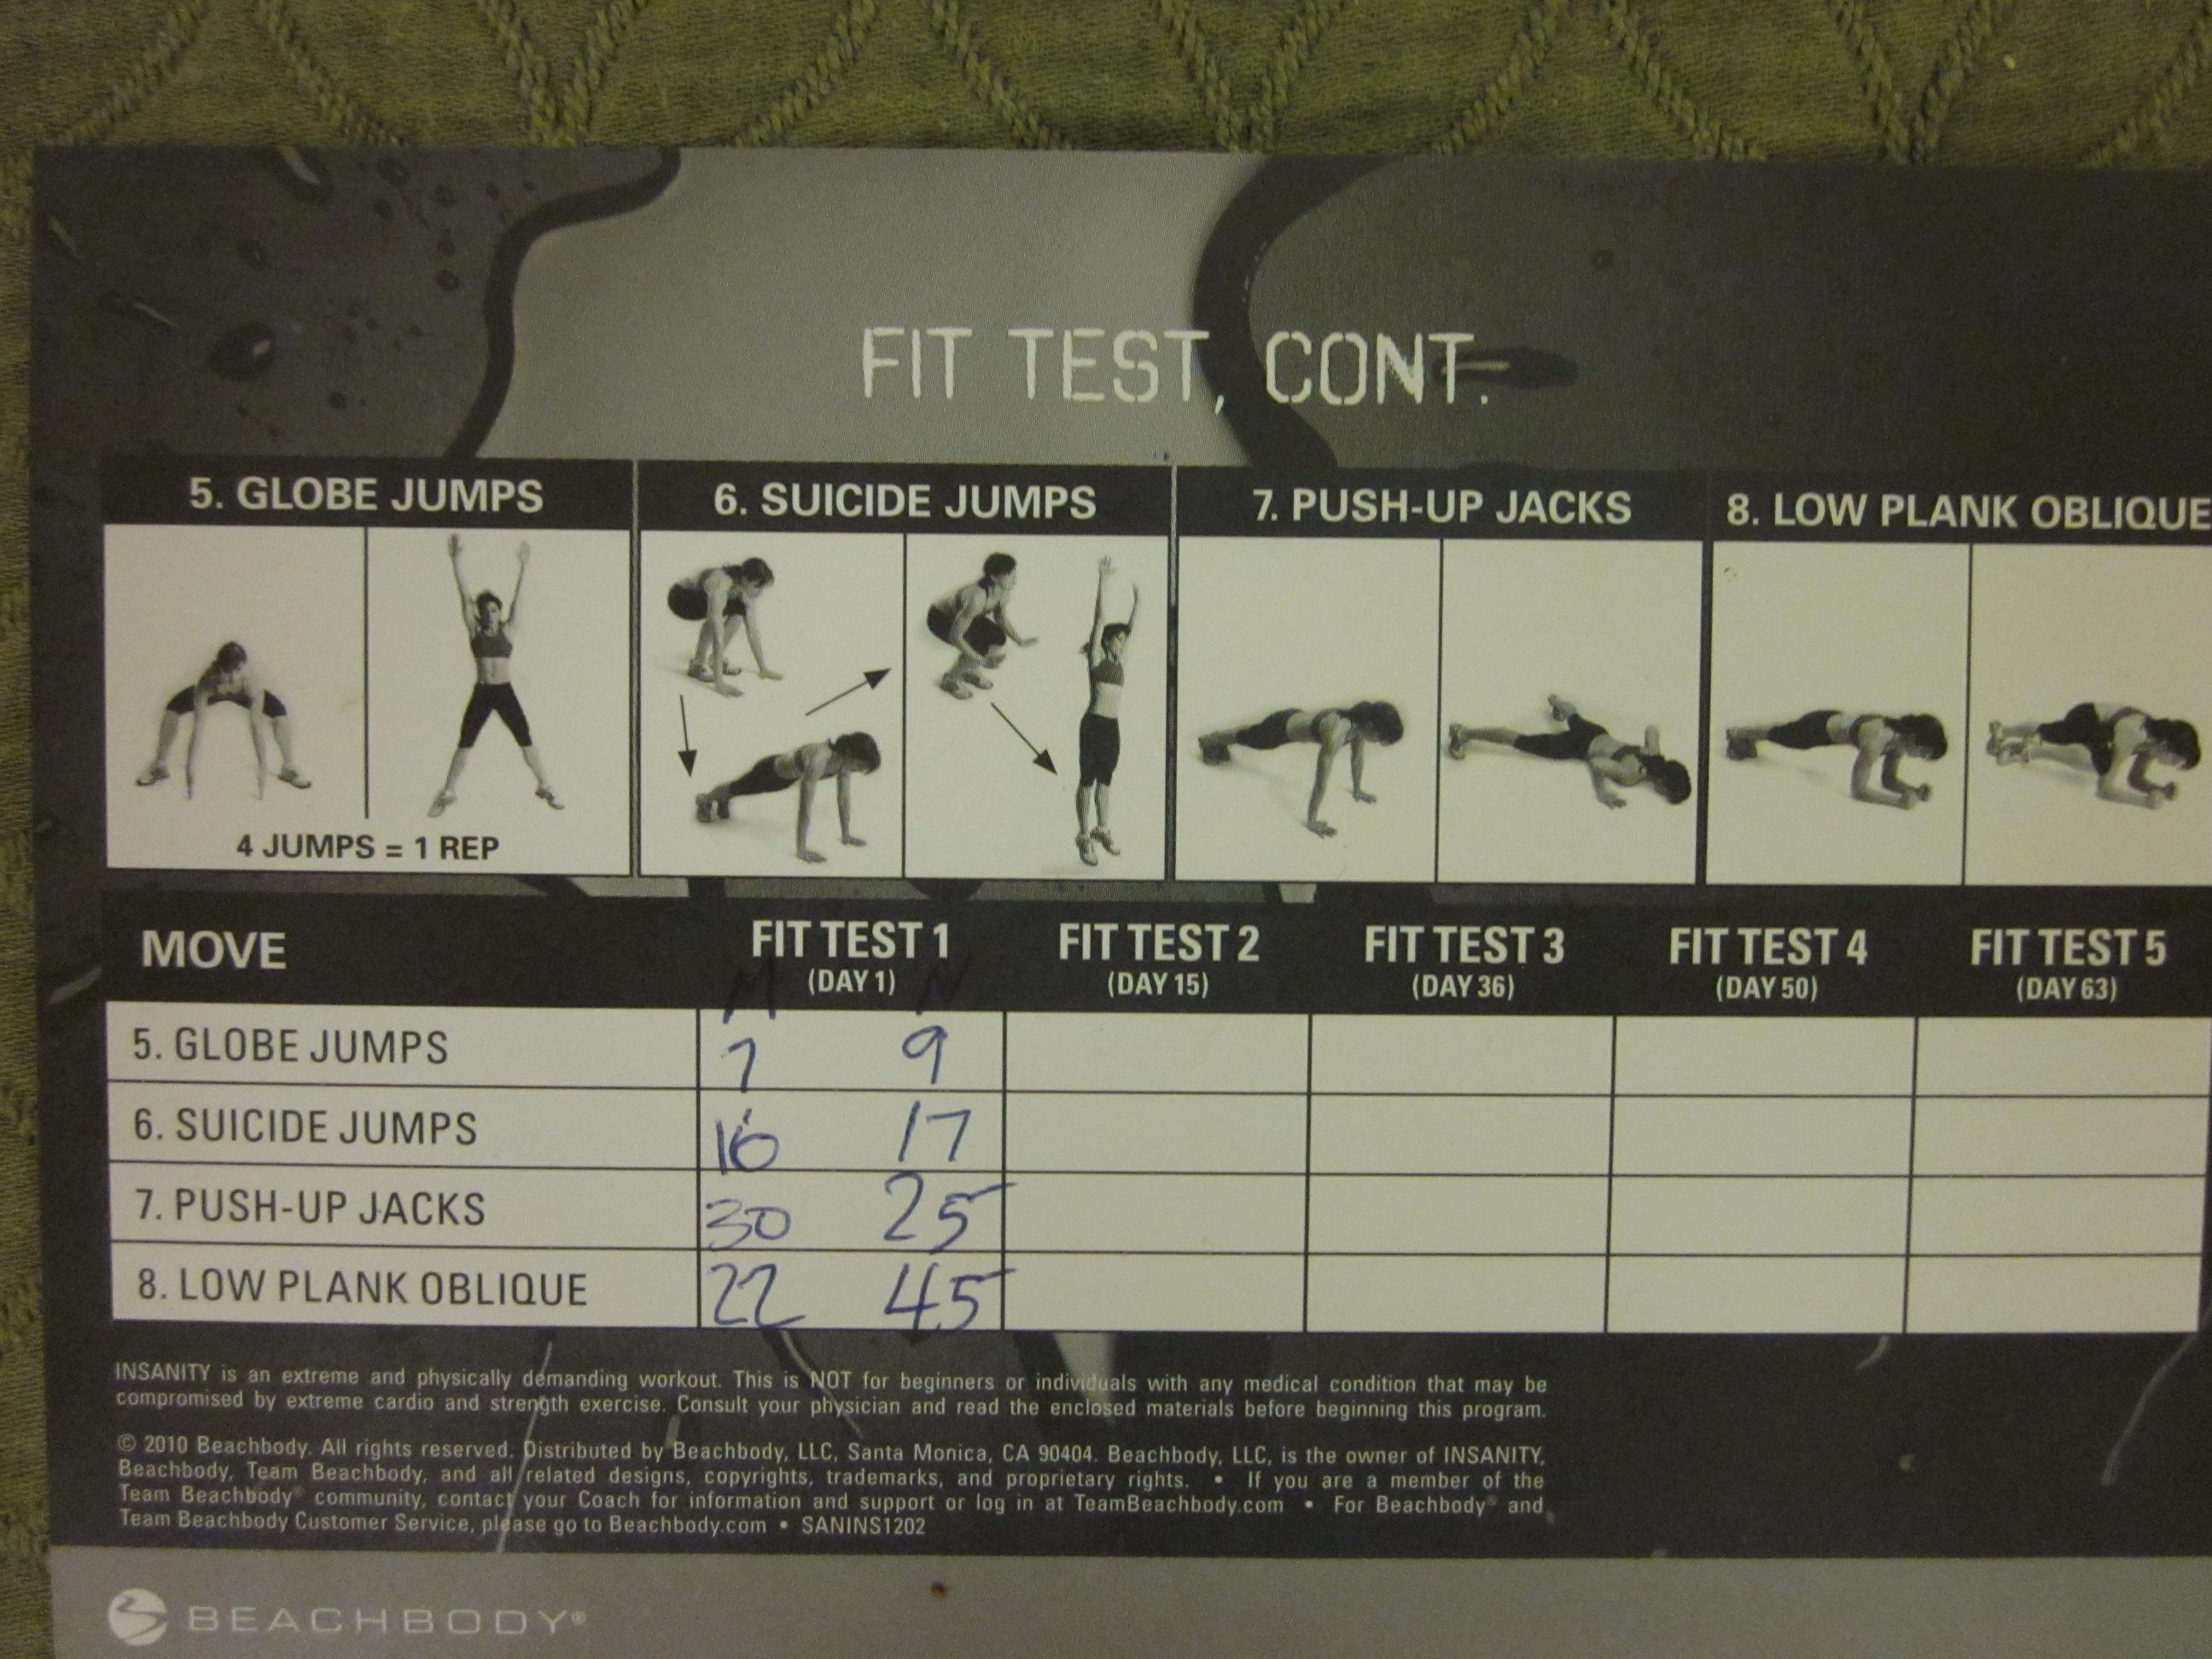 P90x Fitness Test